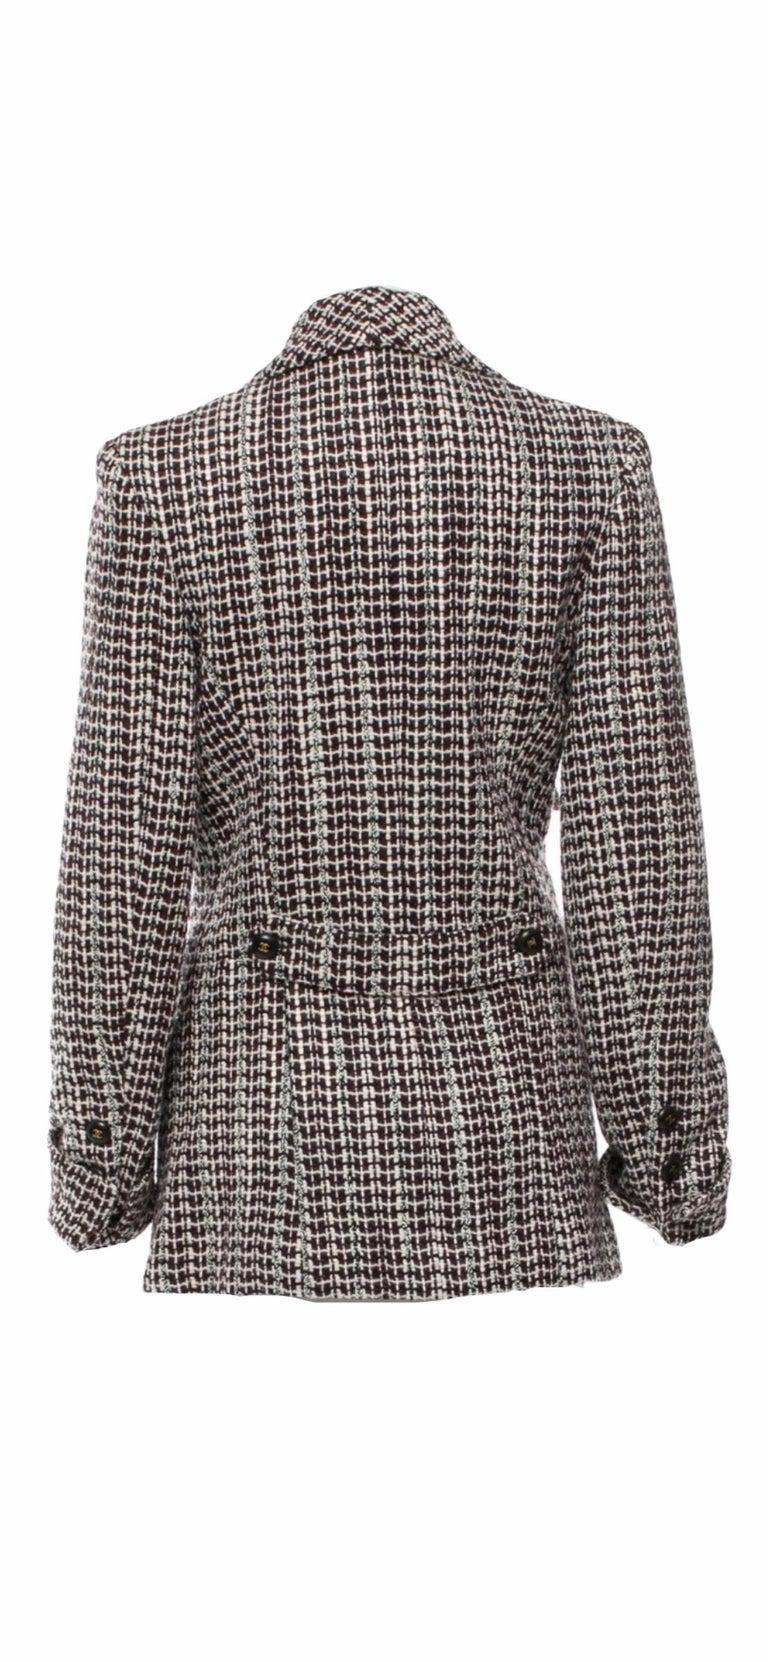 Gray UNWORN Chanel Tweed & Sequins CC Logo Button Short Coat Jacket Blazer For Sale